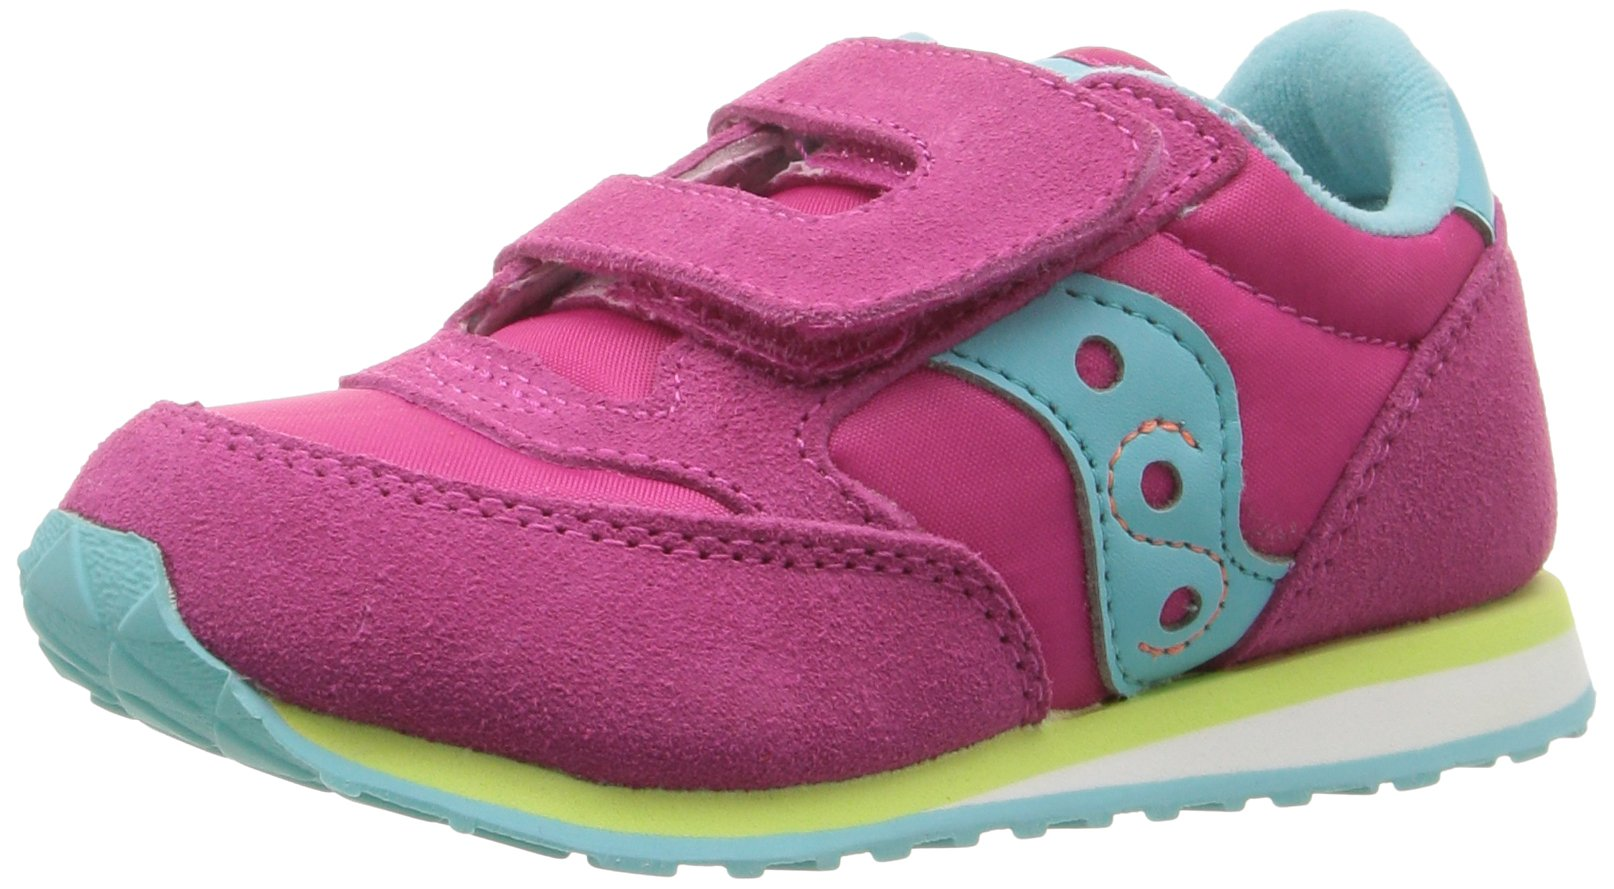 Saucony Girls Baby Jazz HL Sneaker, Pink/Trq/LM, 10.5 M US Little Kid